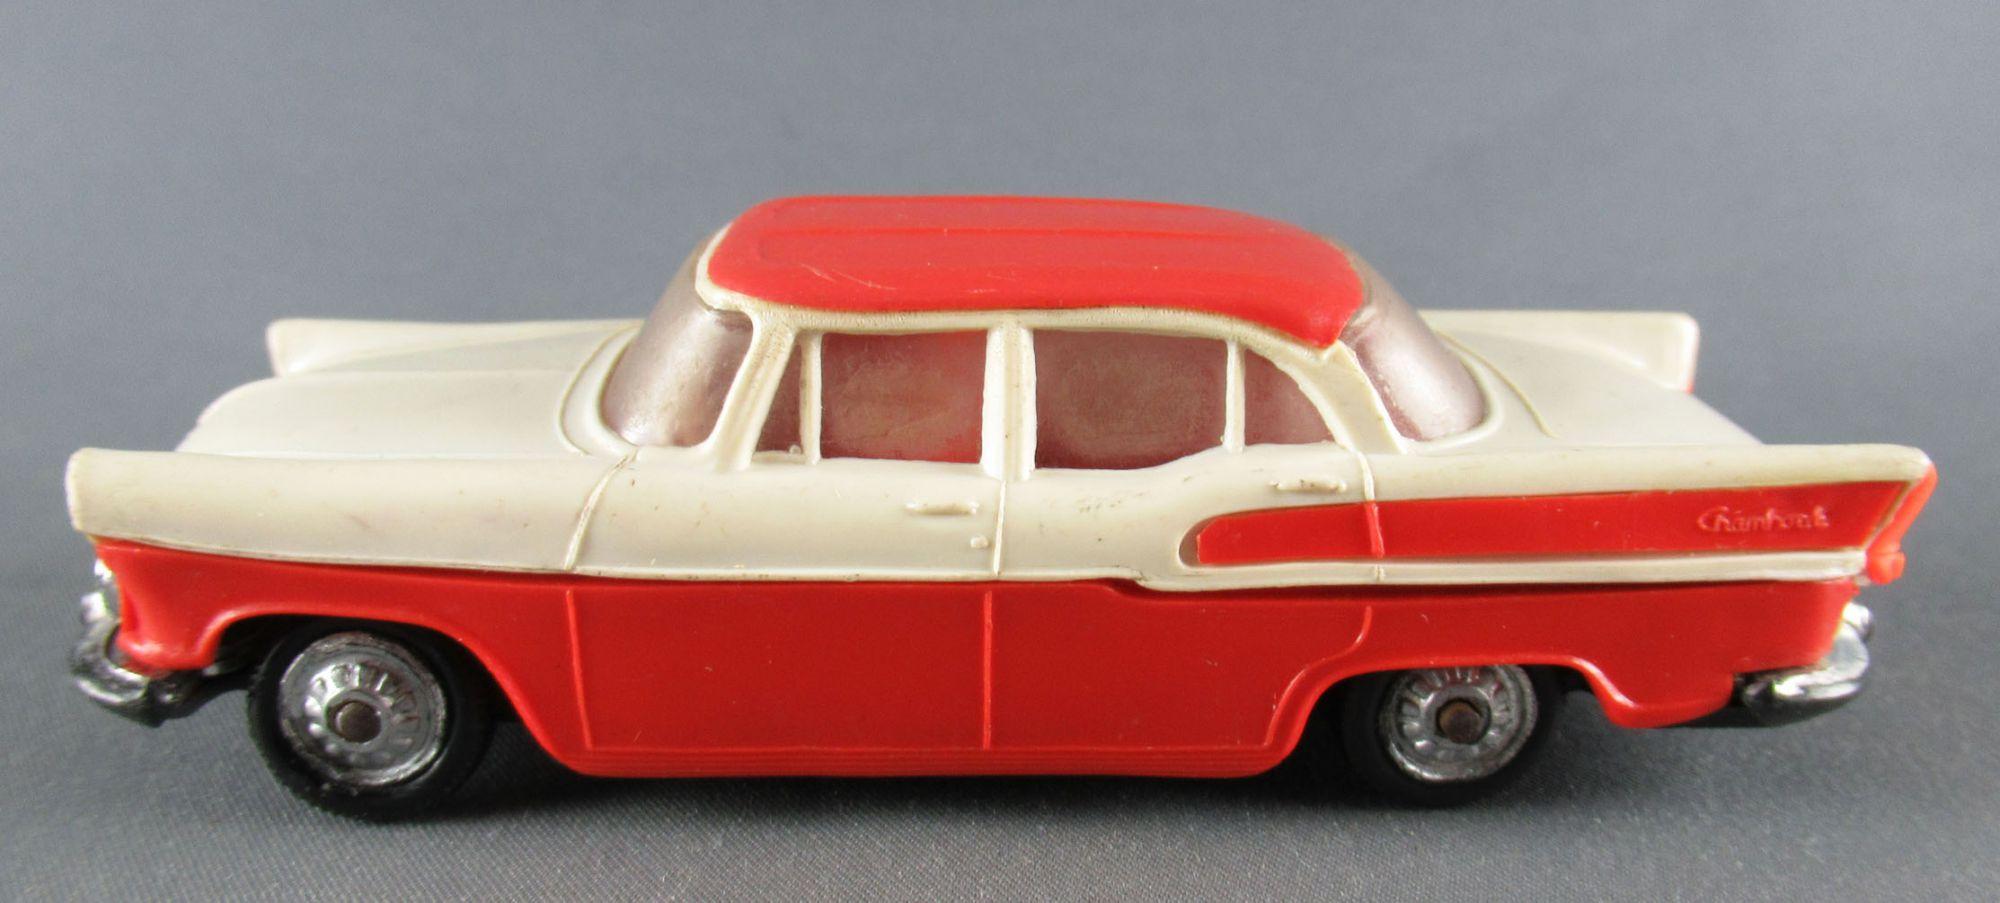 Norev N° 40 Simca Chambord Red & Cream 1:43